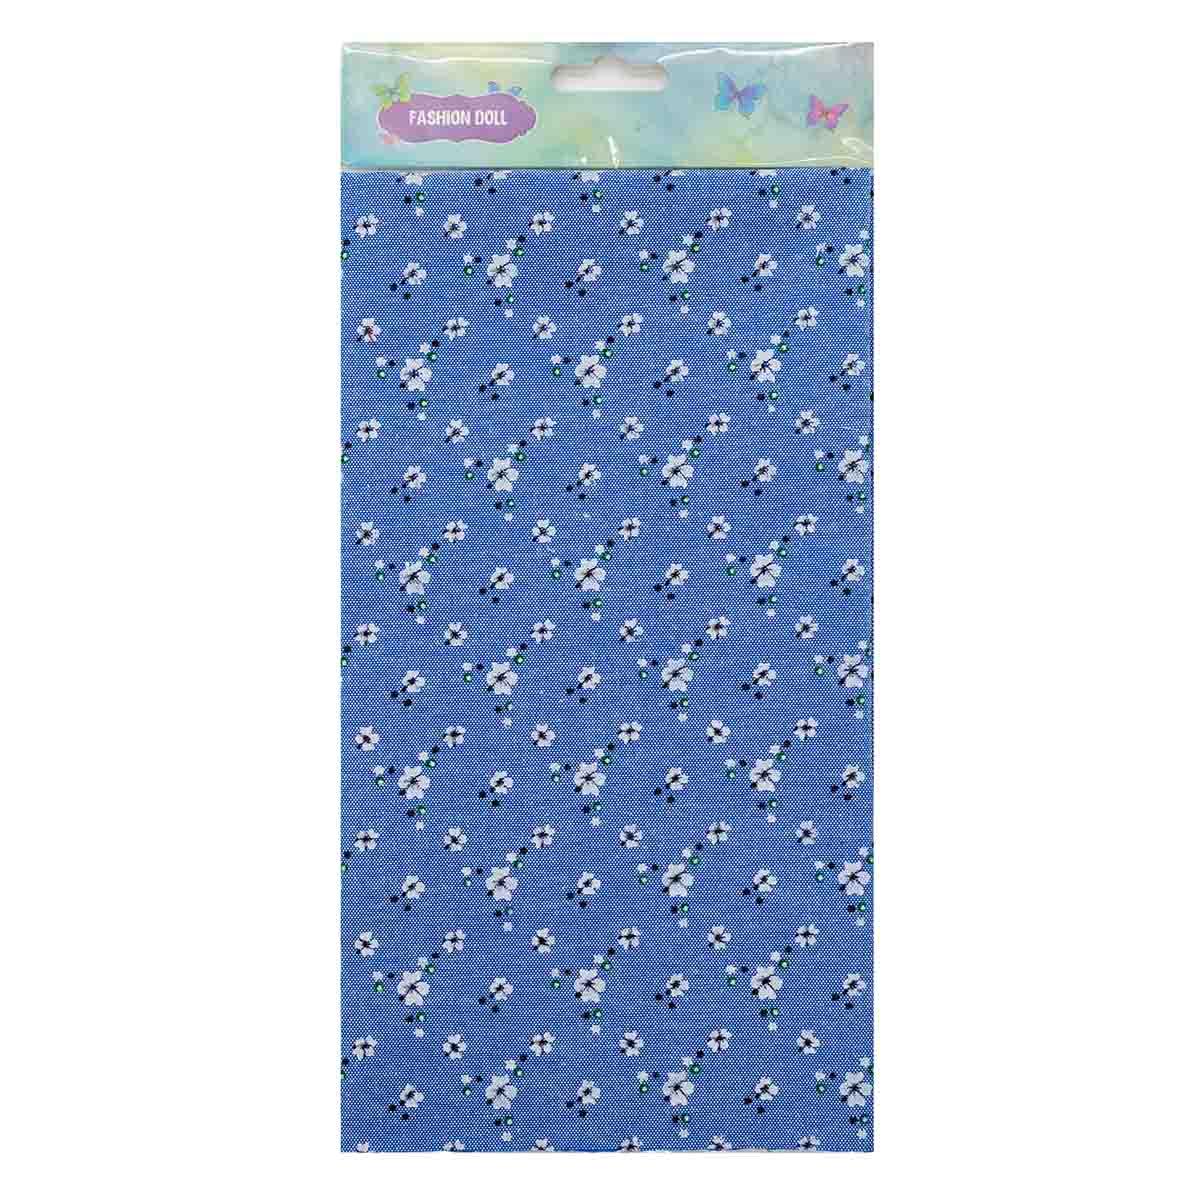 25897 Ткань FD 'Цветочки-1', 48*50см (80% п/э, 20% х/б), голубой